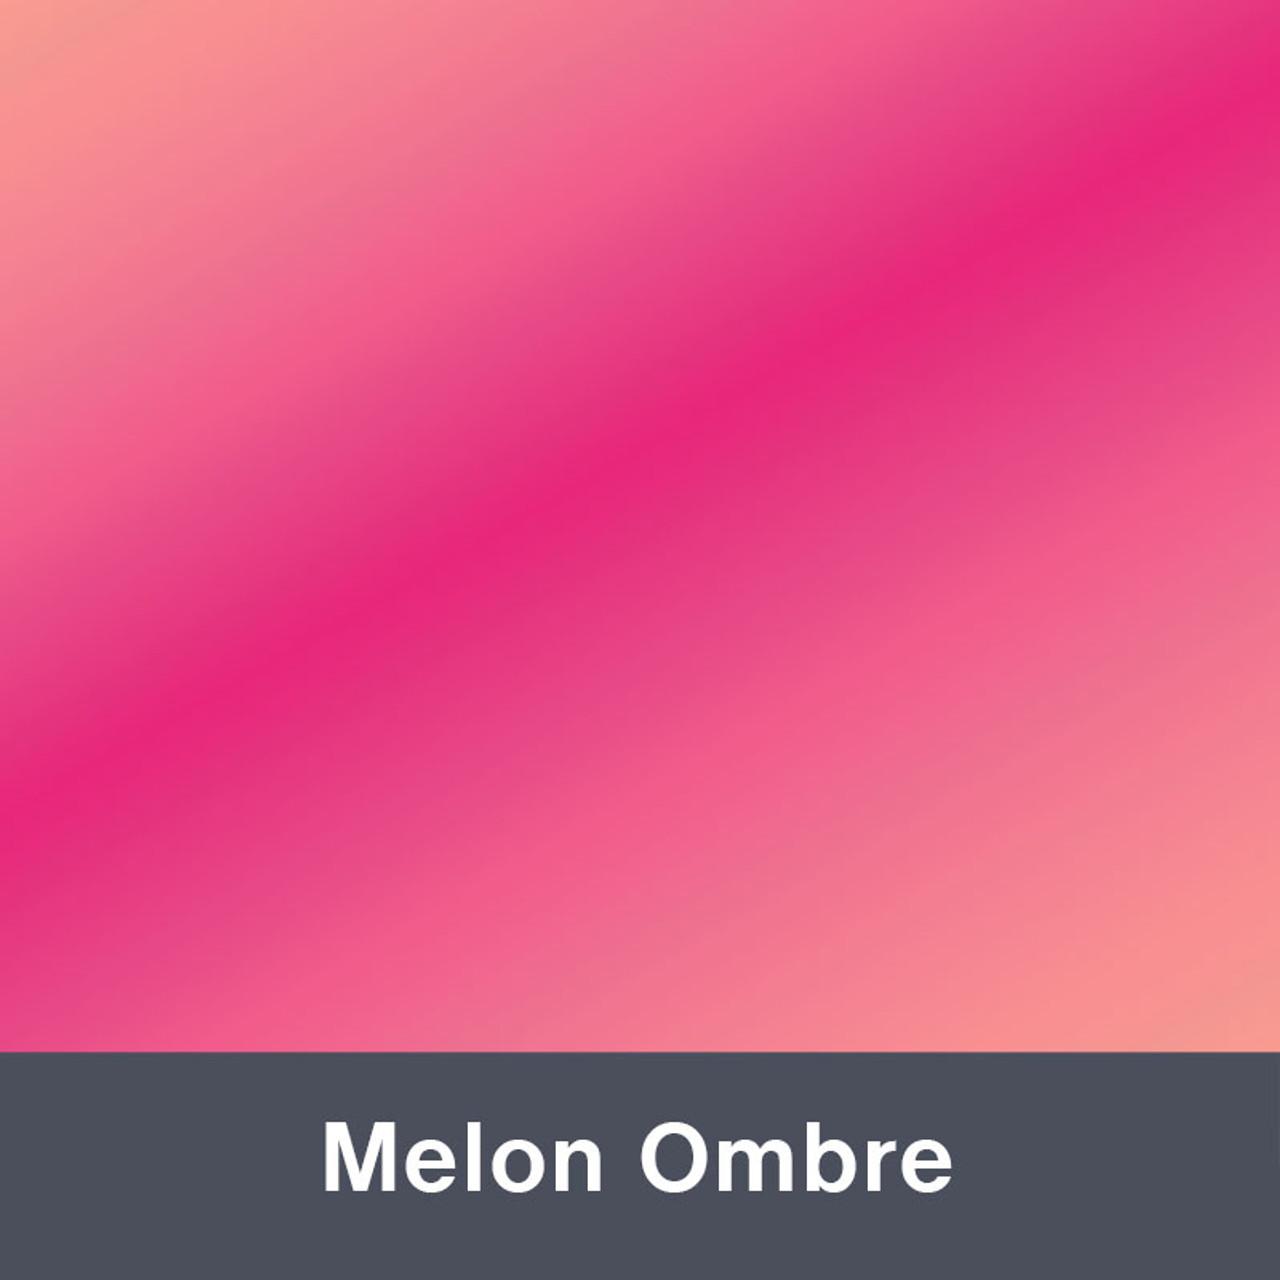 Melon Ombre